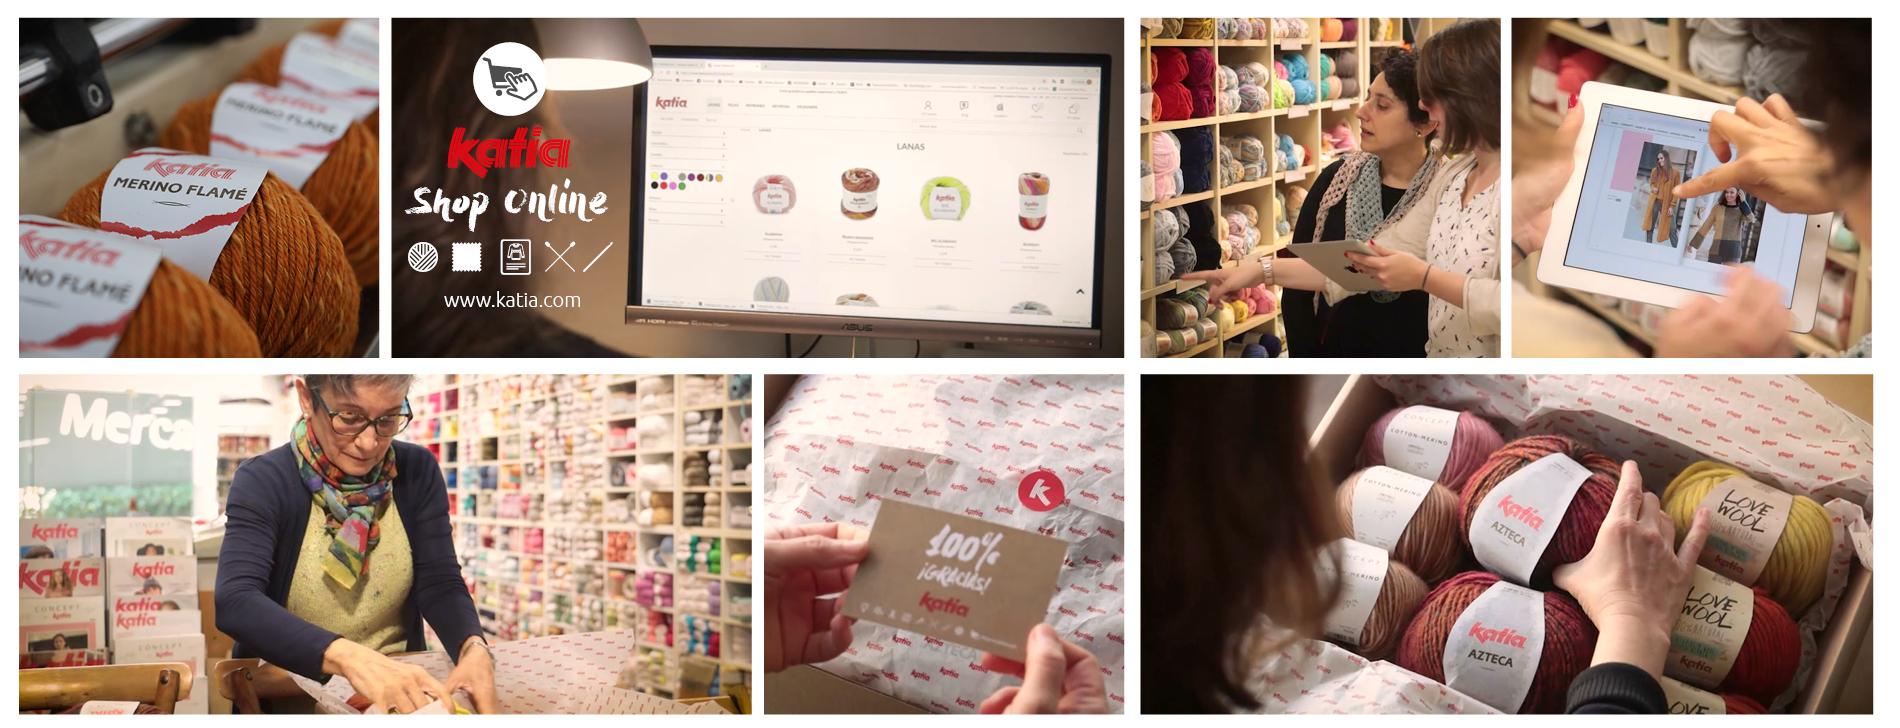 katia-shop-online-yarns-fabrics-SLIDE